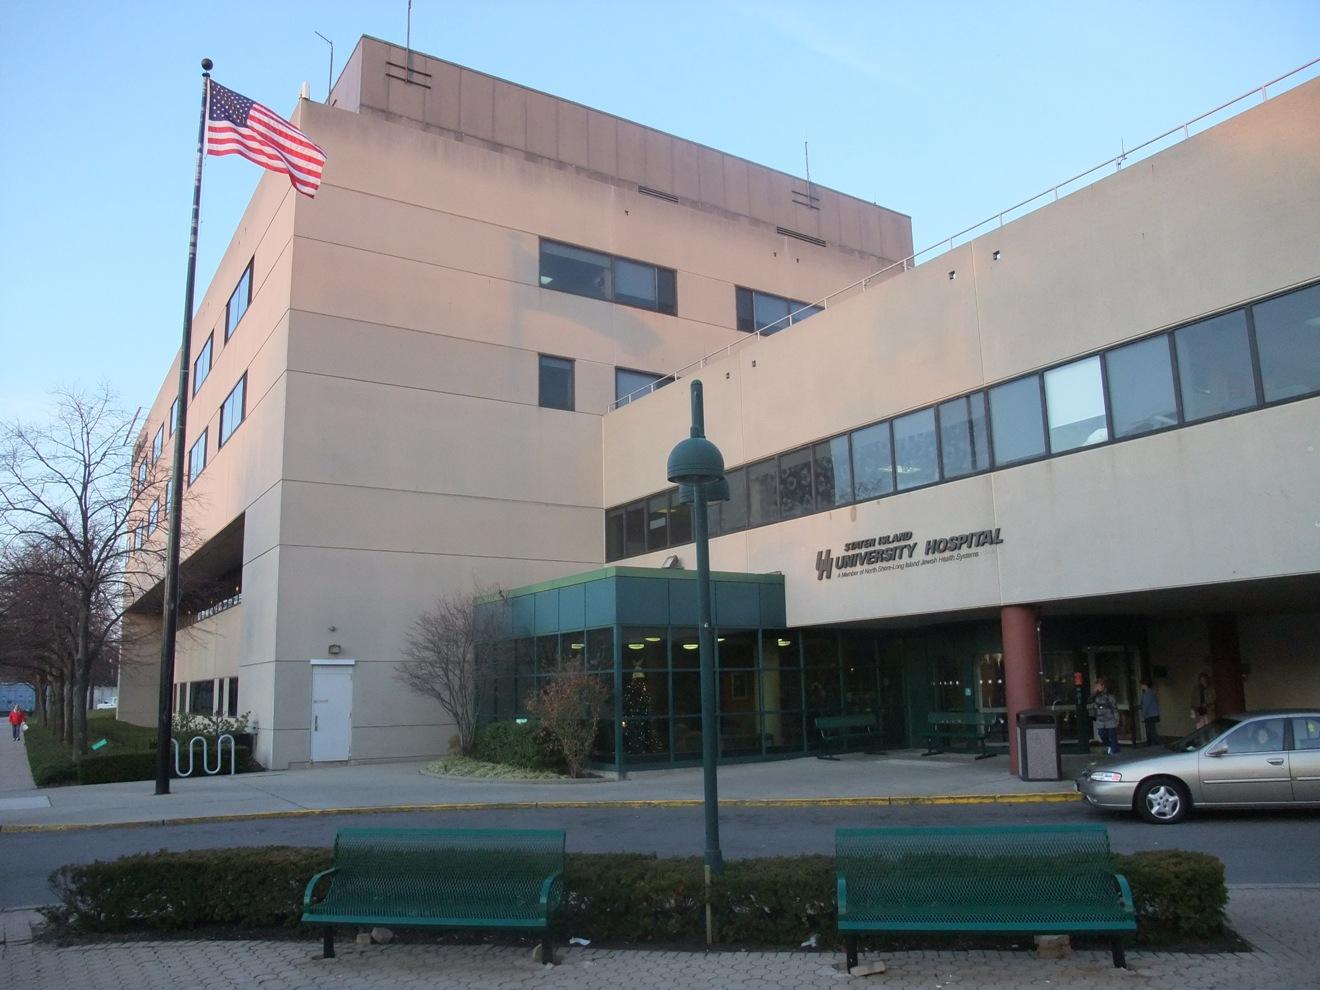 Staten Island University Hospital Cafeteria